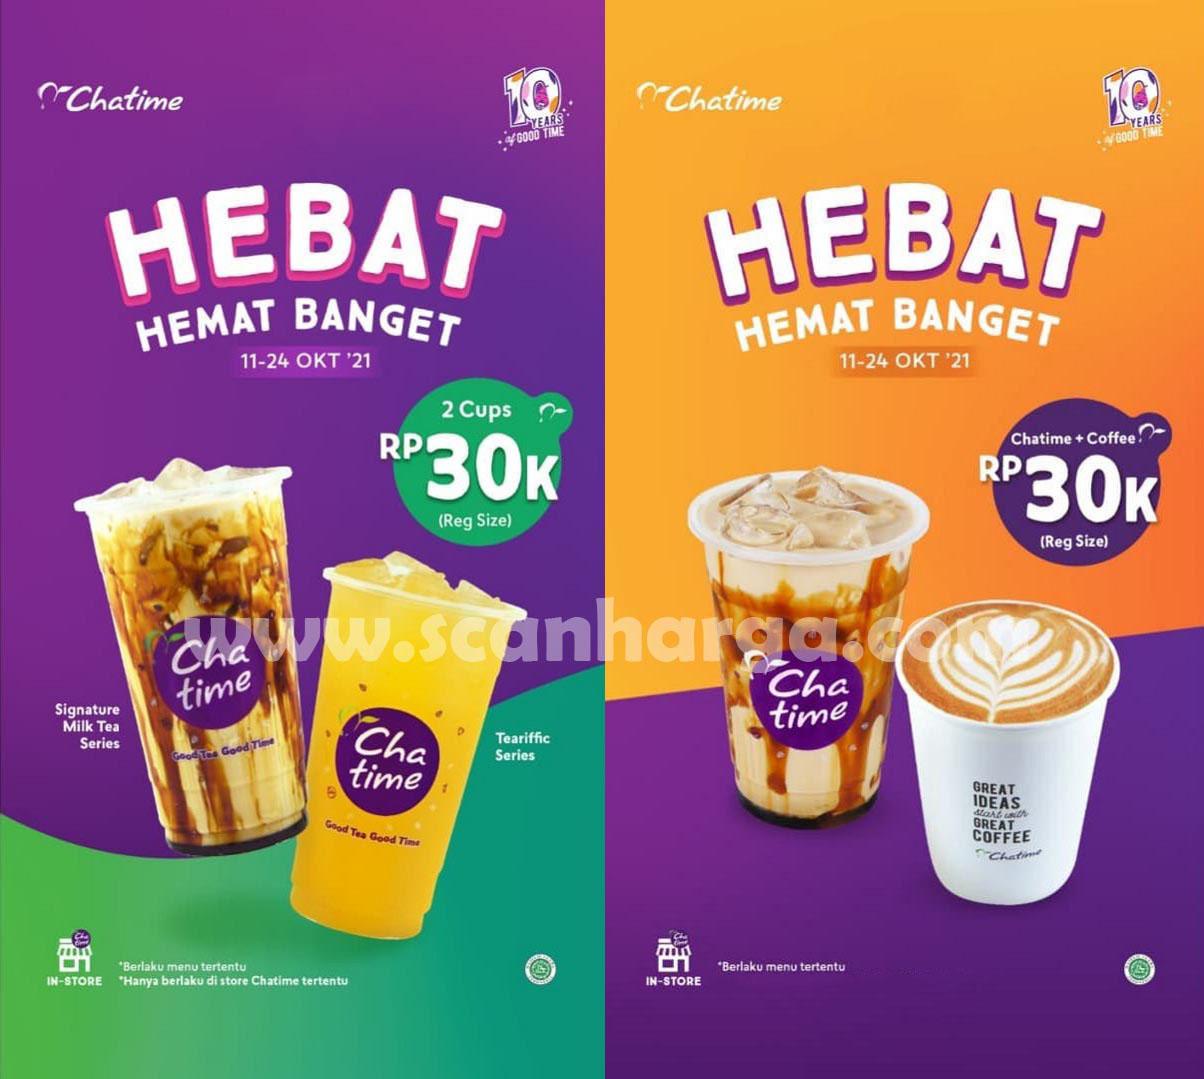 Promo CHATIME Paket HEBAT (HEMAT BANGET) – Beli 2 Cup Large cuma Rp. 30.000